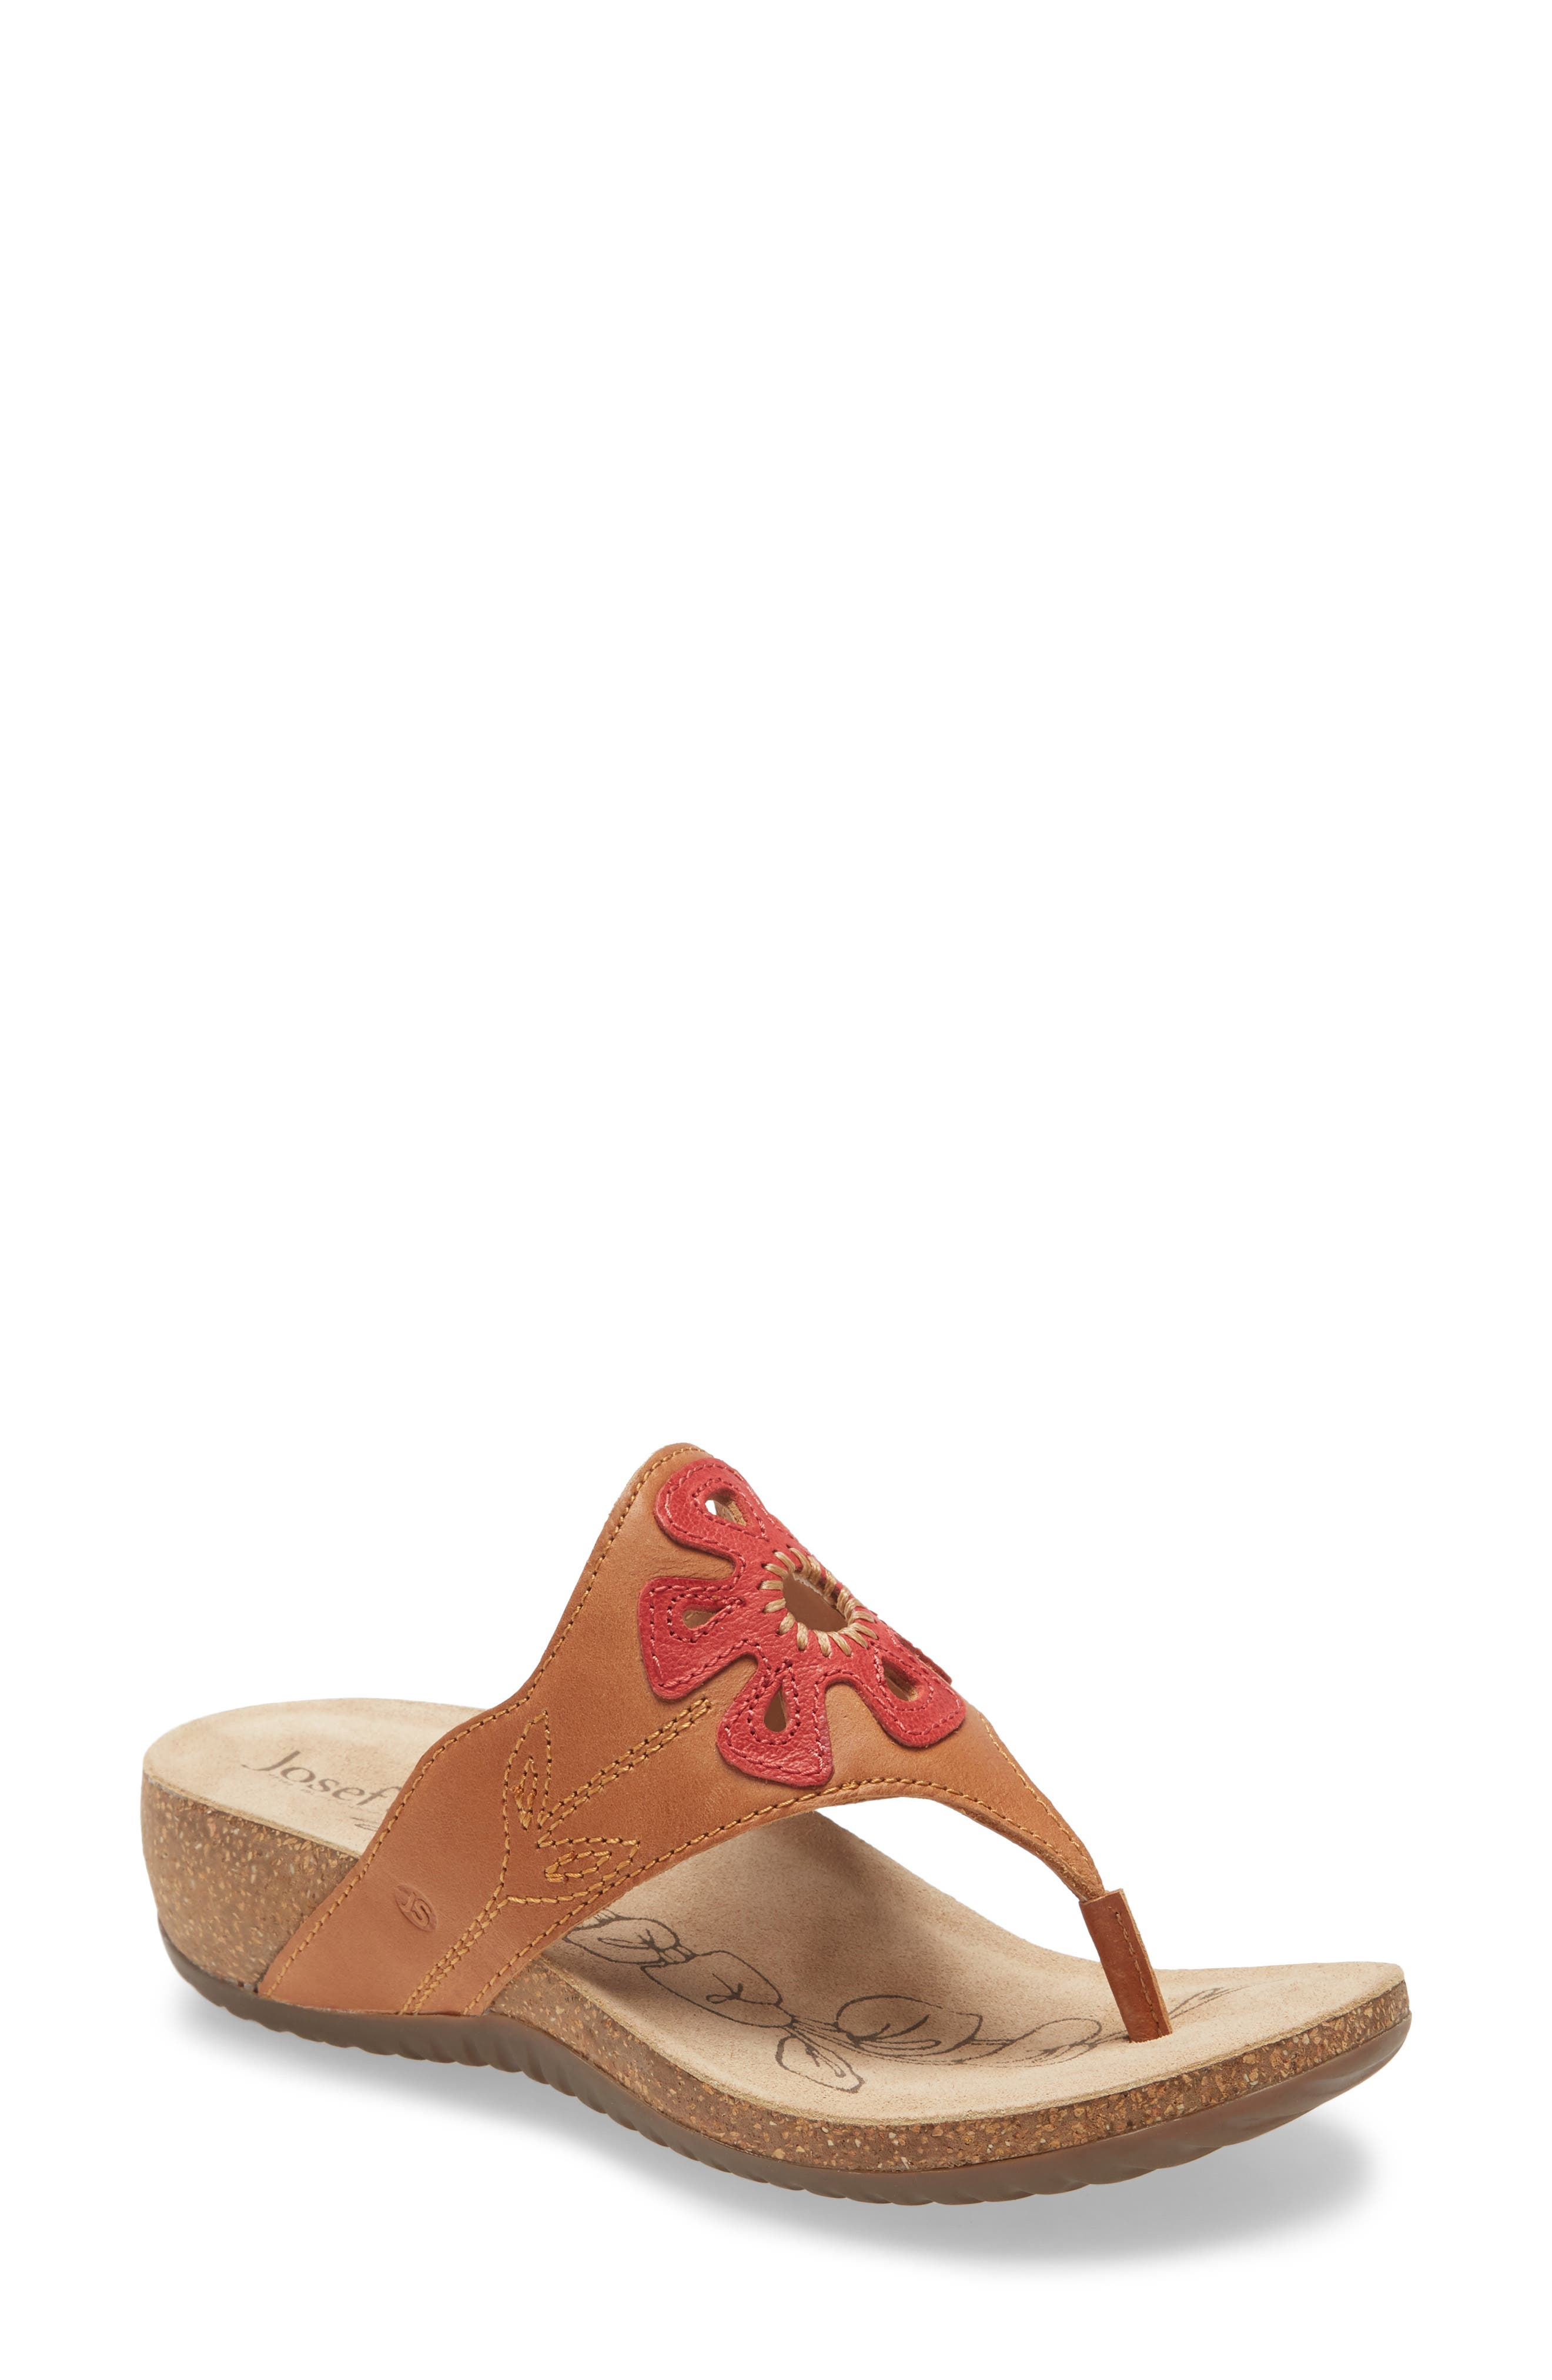 Natalya 09 Sandal